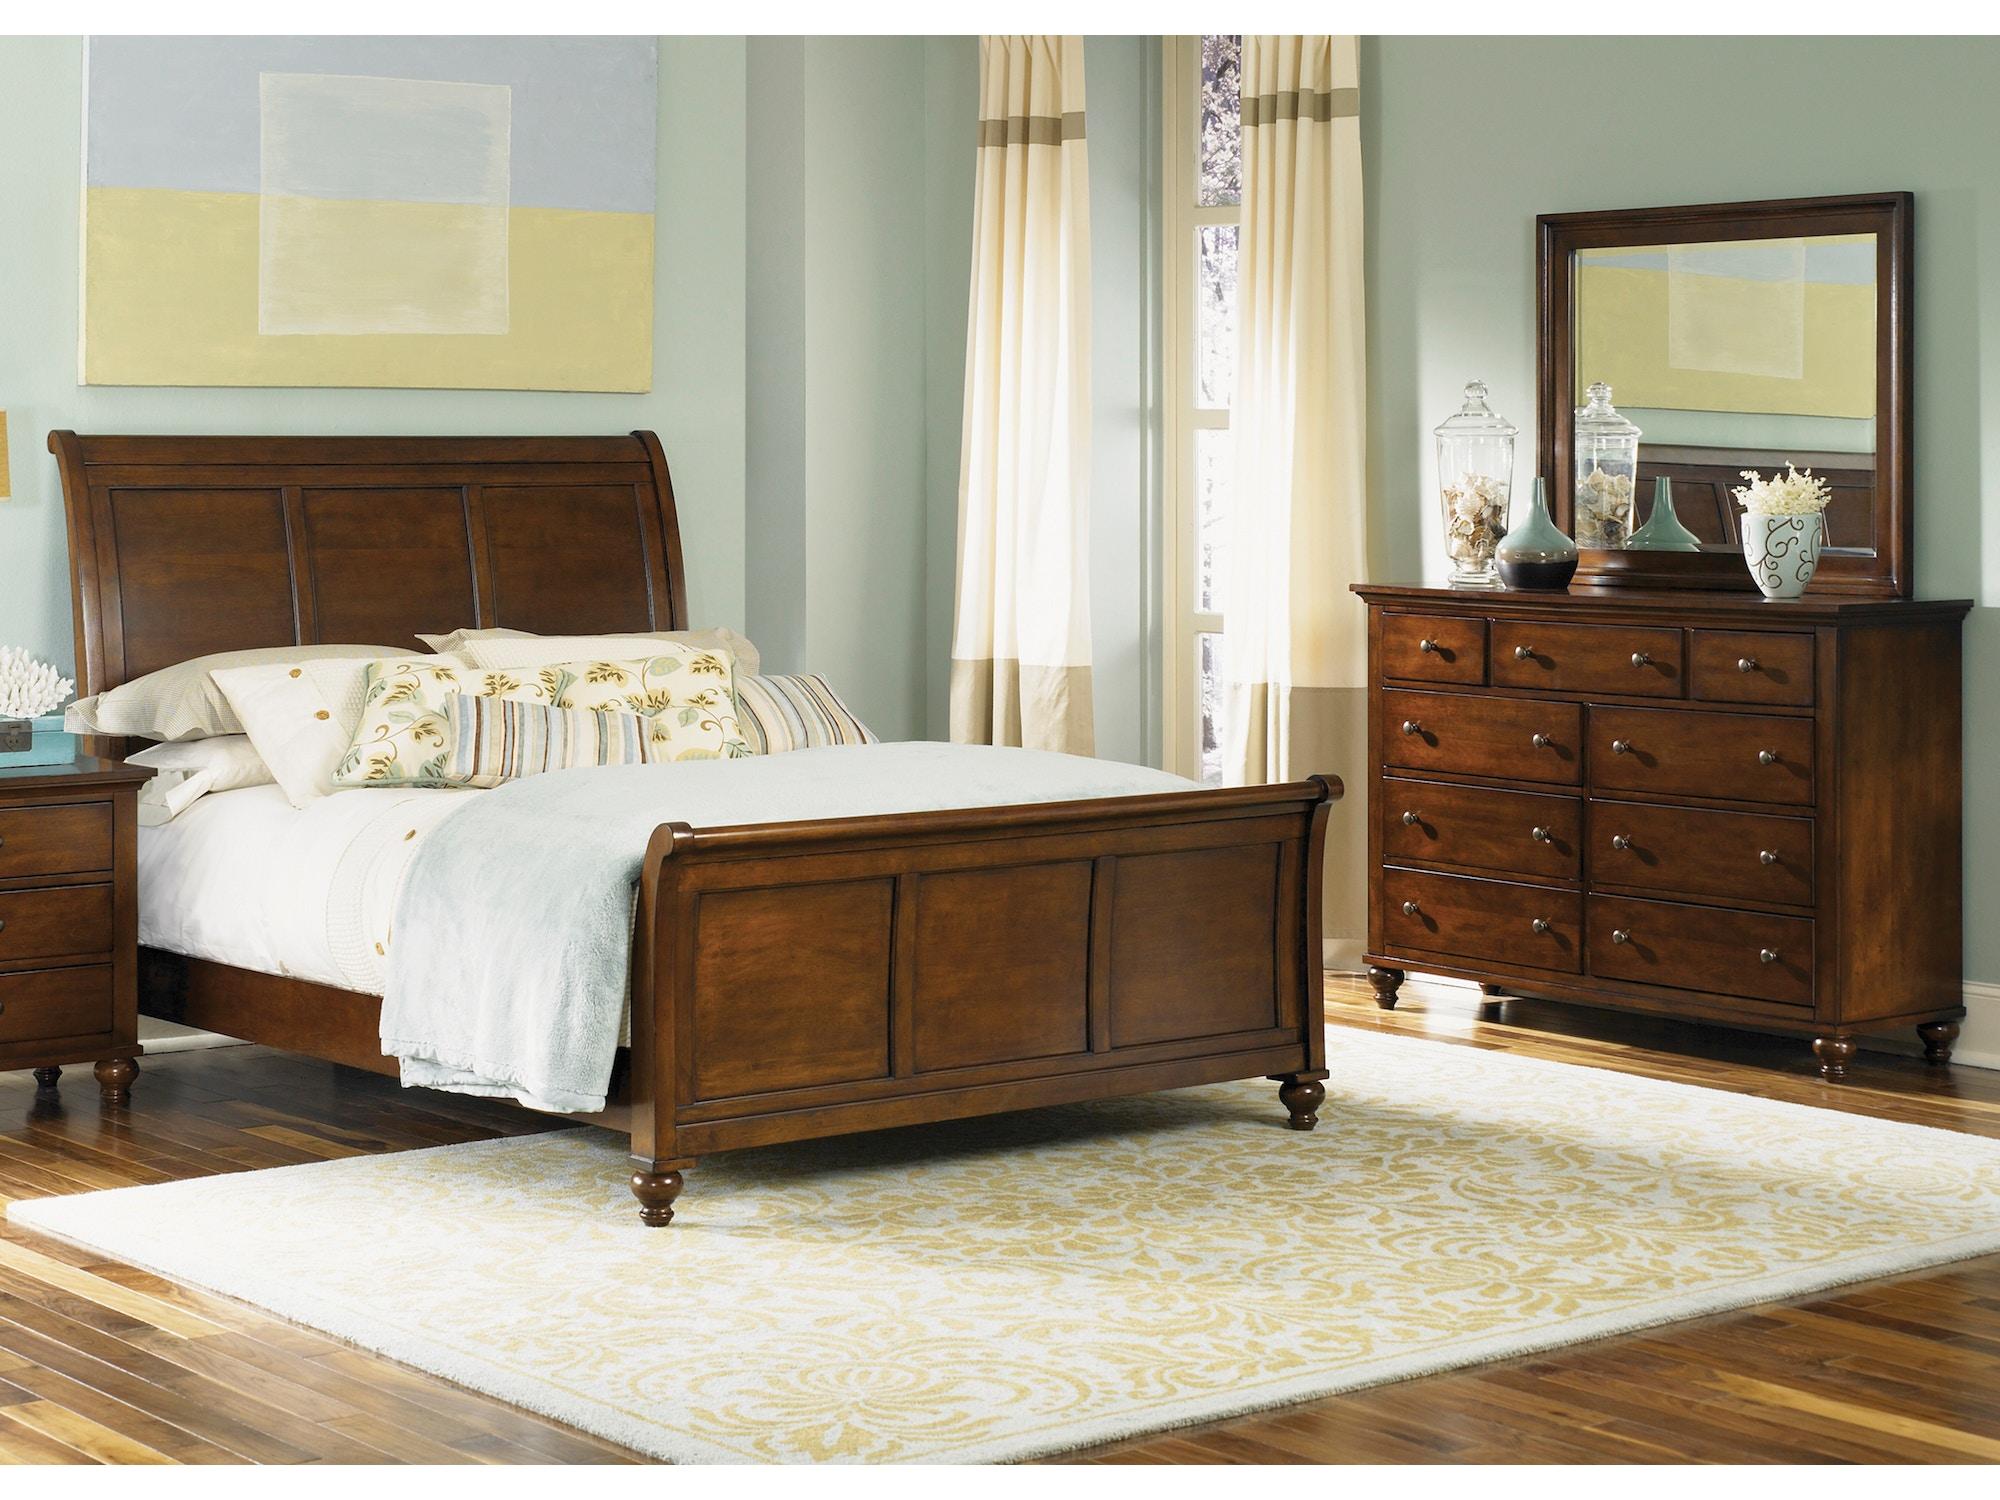 Liberty Furniture Bedroom Master Bedroom Sets Furniture Fair - Furniture fair bedroom sets